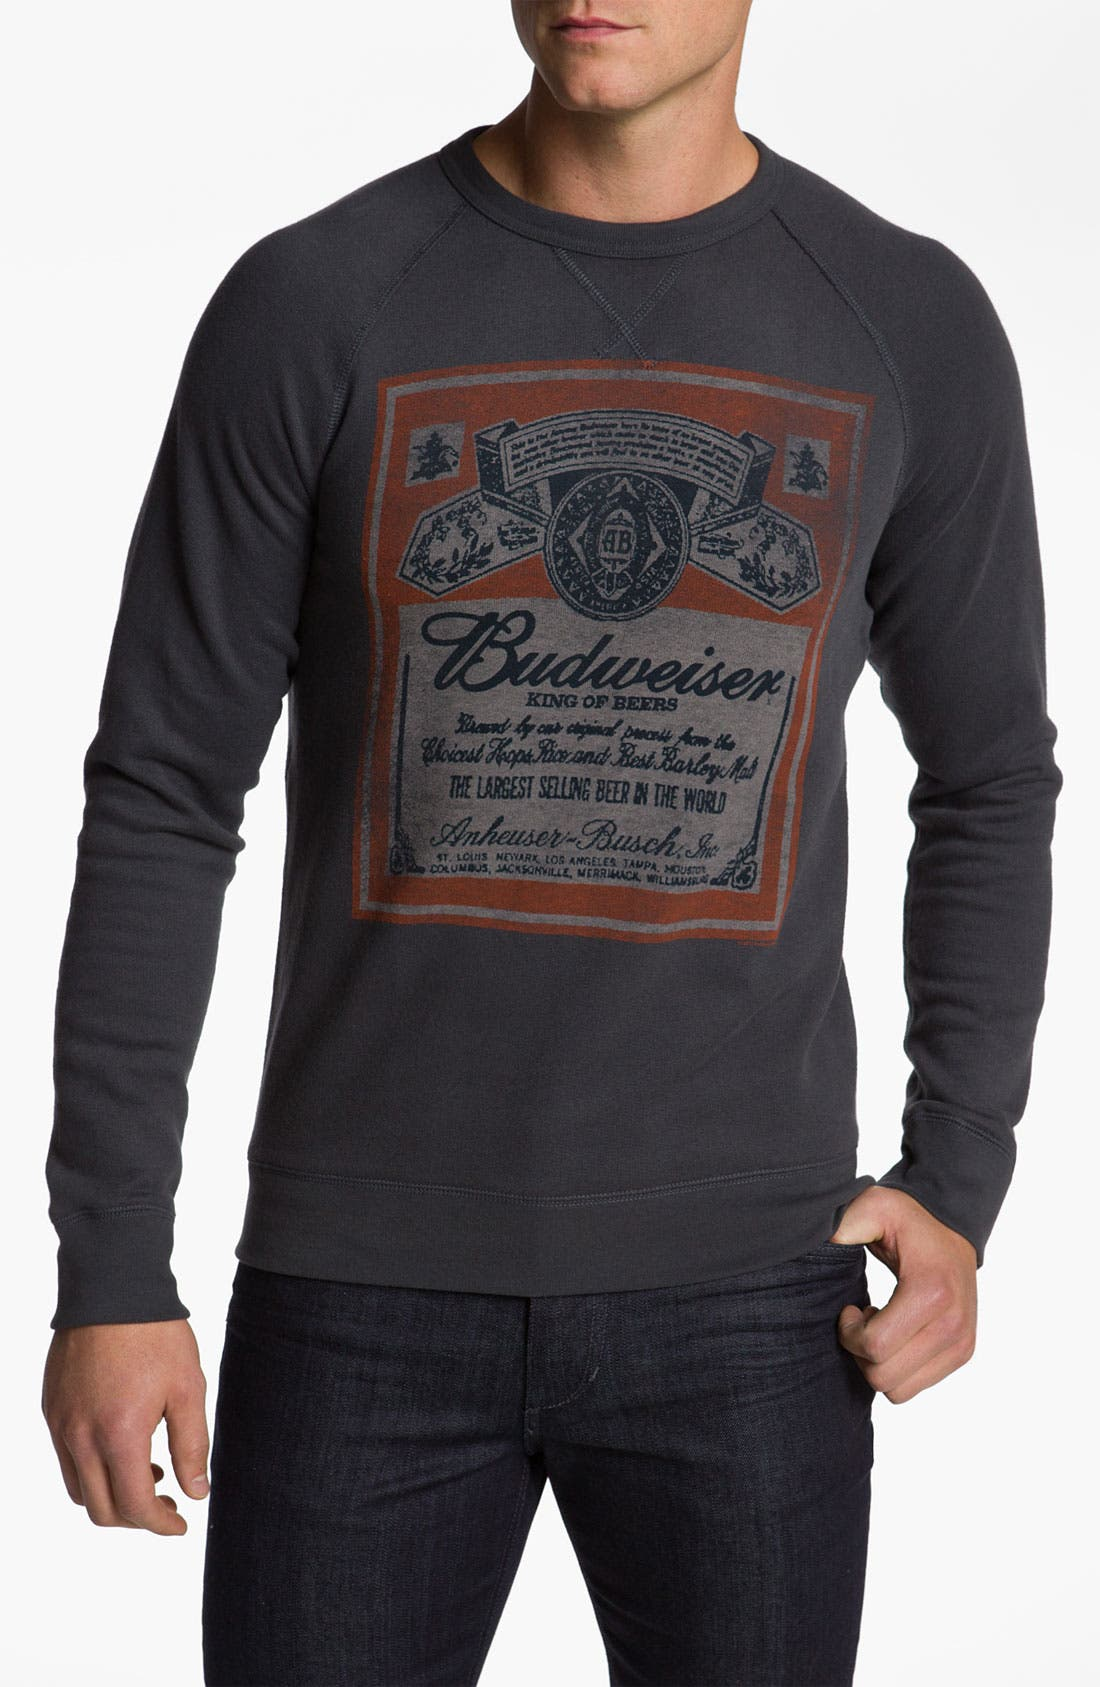 Main Image - Junk Food 'Budweiser' Crewneck Sweatshirt